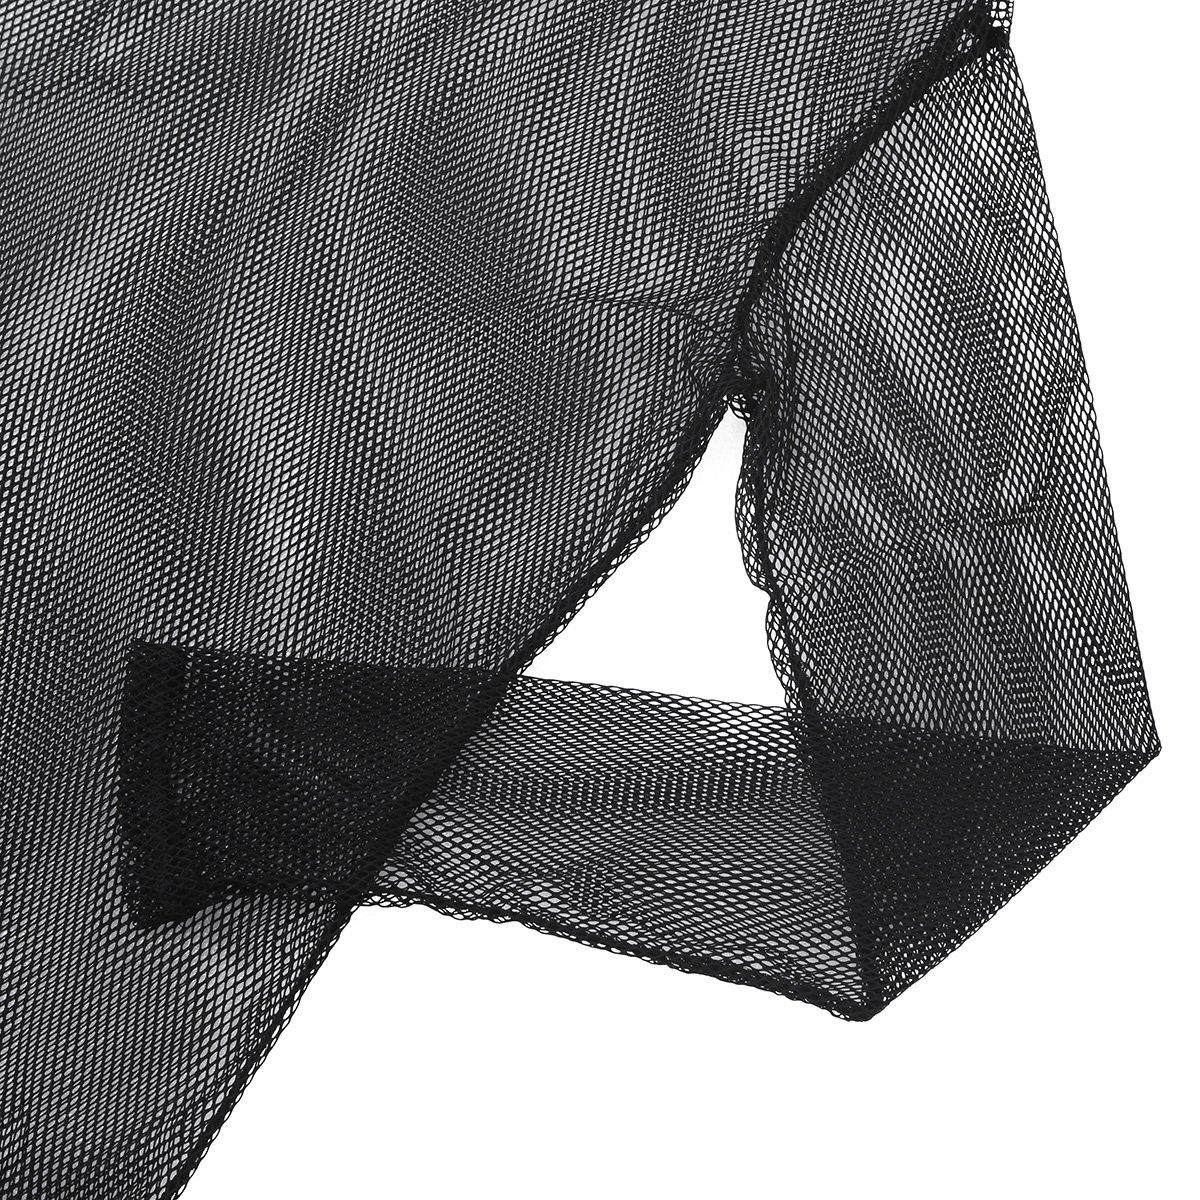 12d9d9ebf29219 CHICTRY Men s Cotton String Mesh Fishnet Long Sleeve T-Shirt Hoodie Blouse  Top  Amazon.co.uk  Clothing